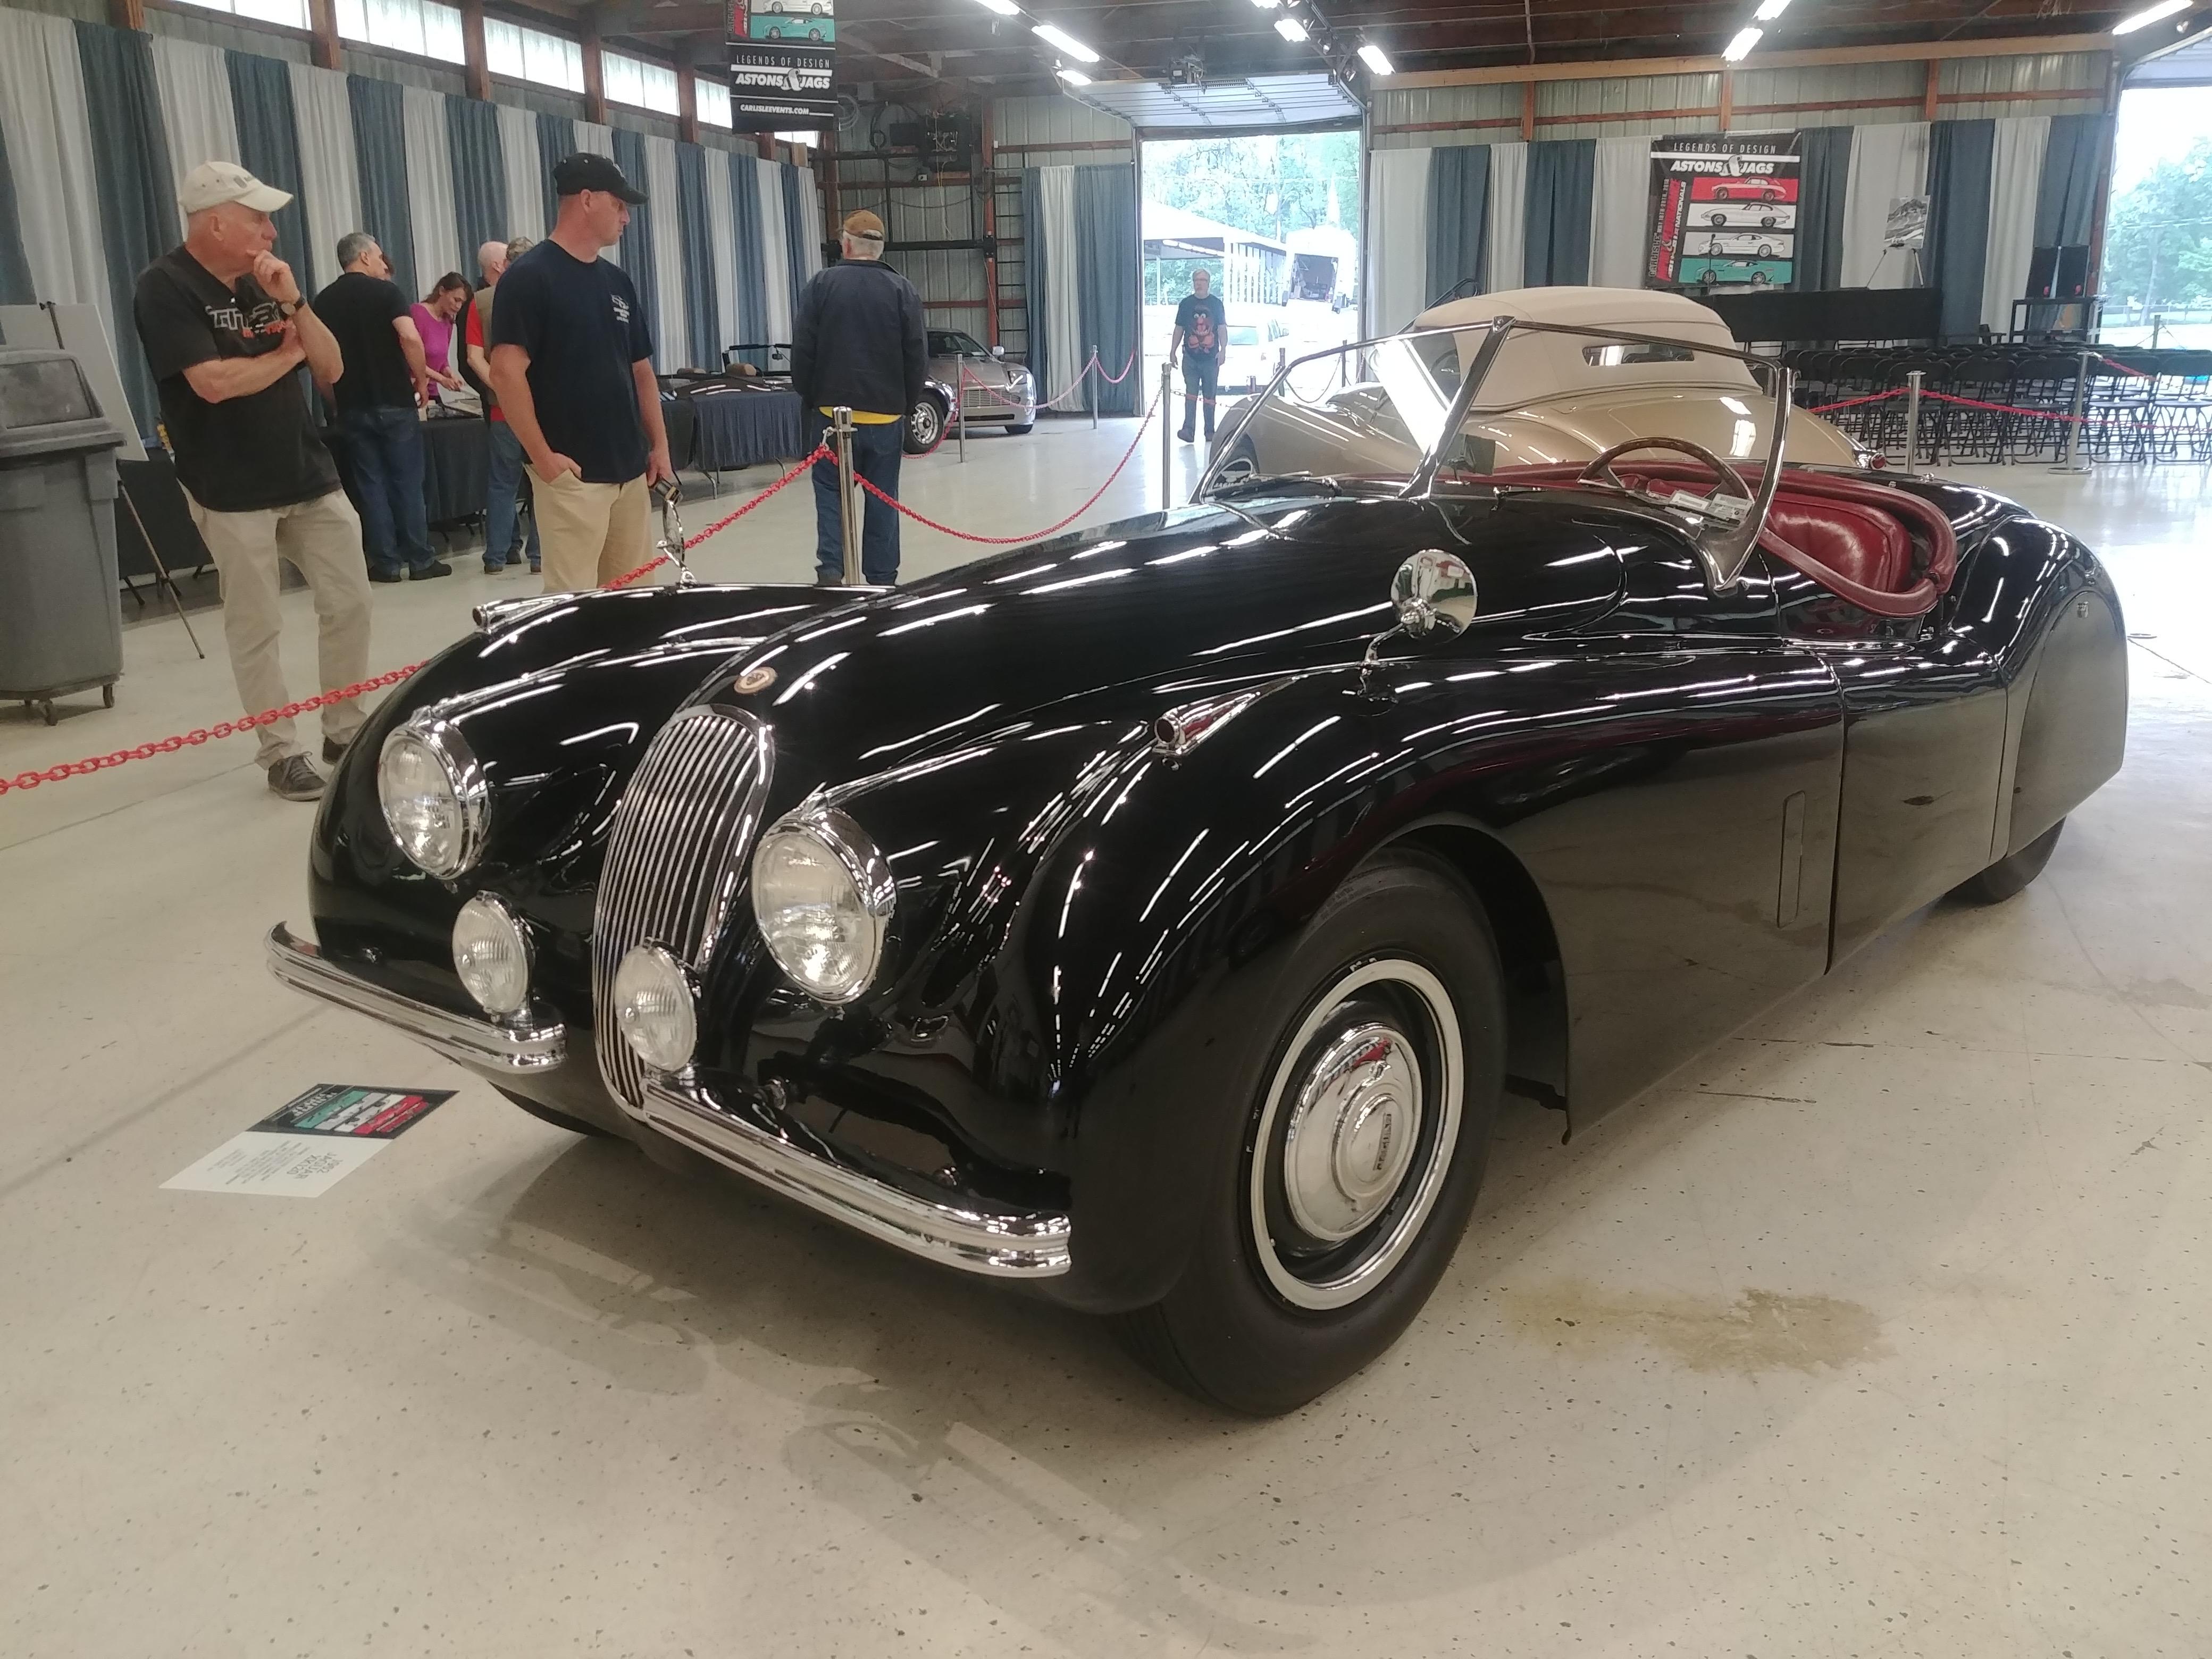 Carlisle Import, Jaguar, Citroen and Saab shine at Carlisle, despite the weather, ClassicCars.com Journal